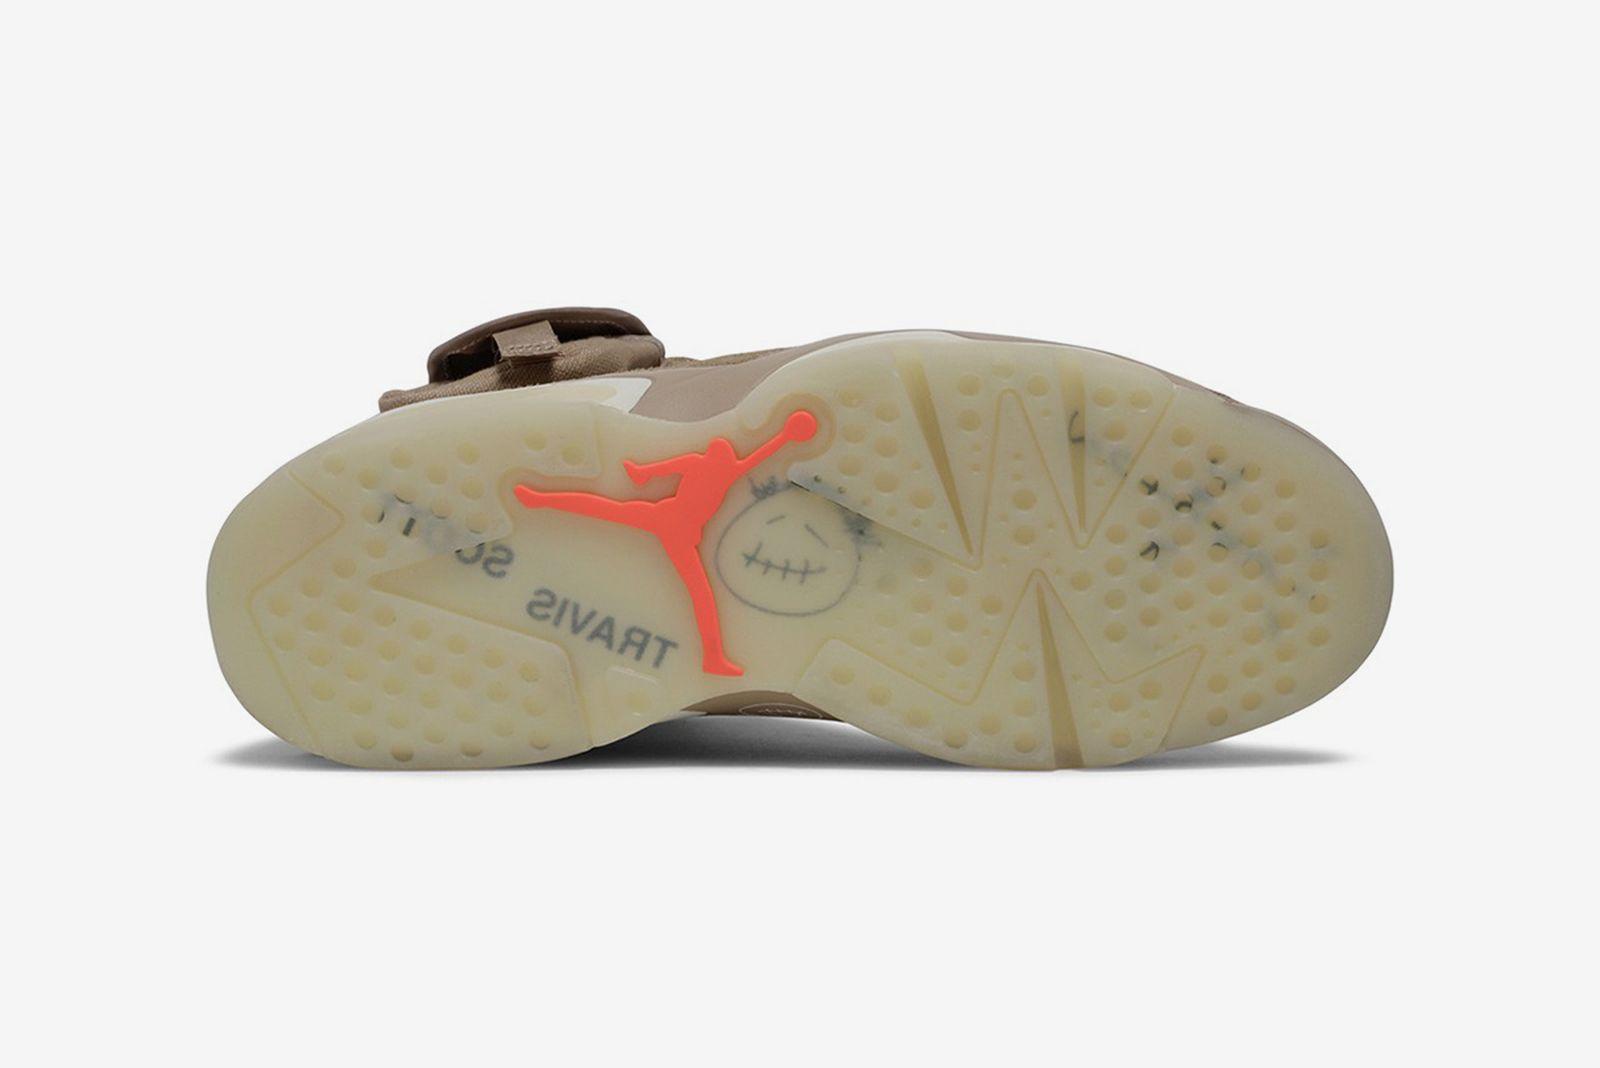 travis-scott-air-jordan-6-british-khaki-release-date-price-04